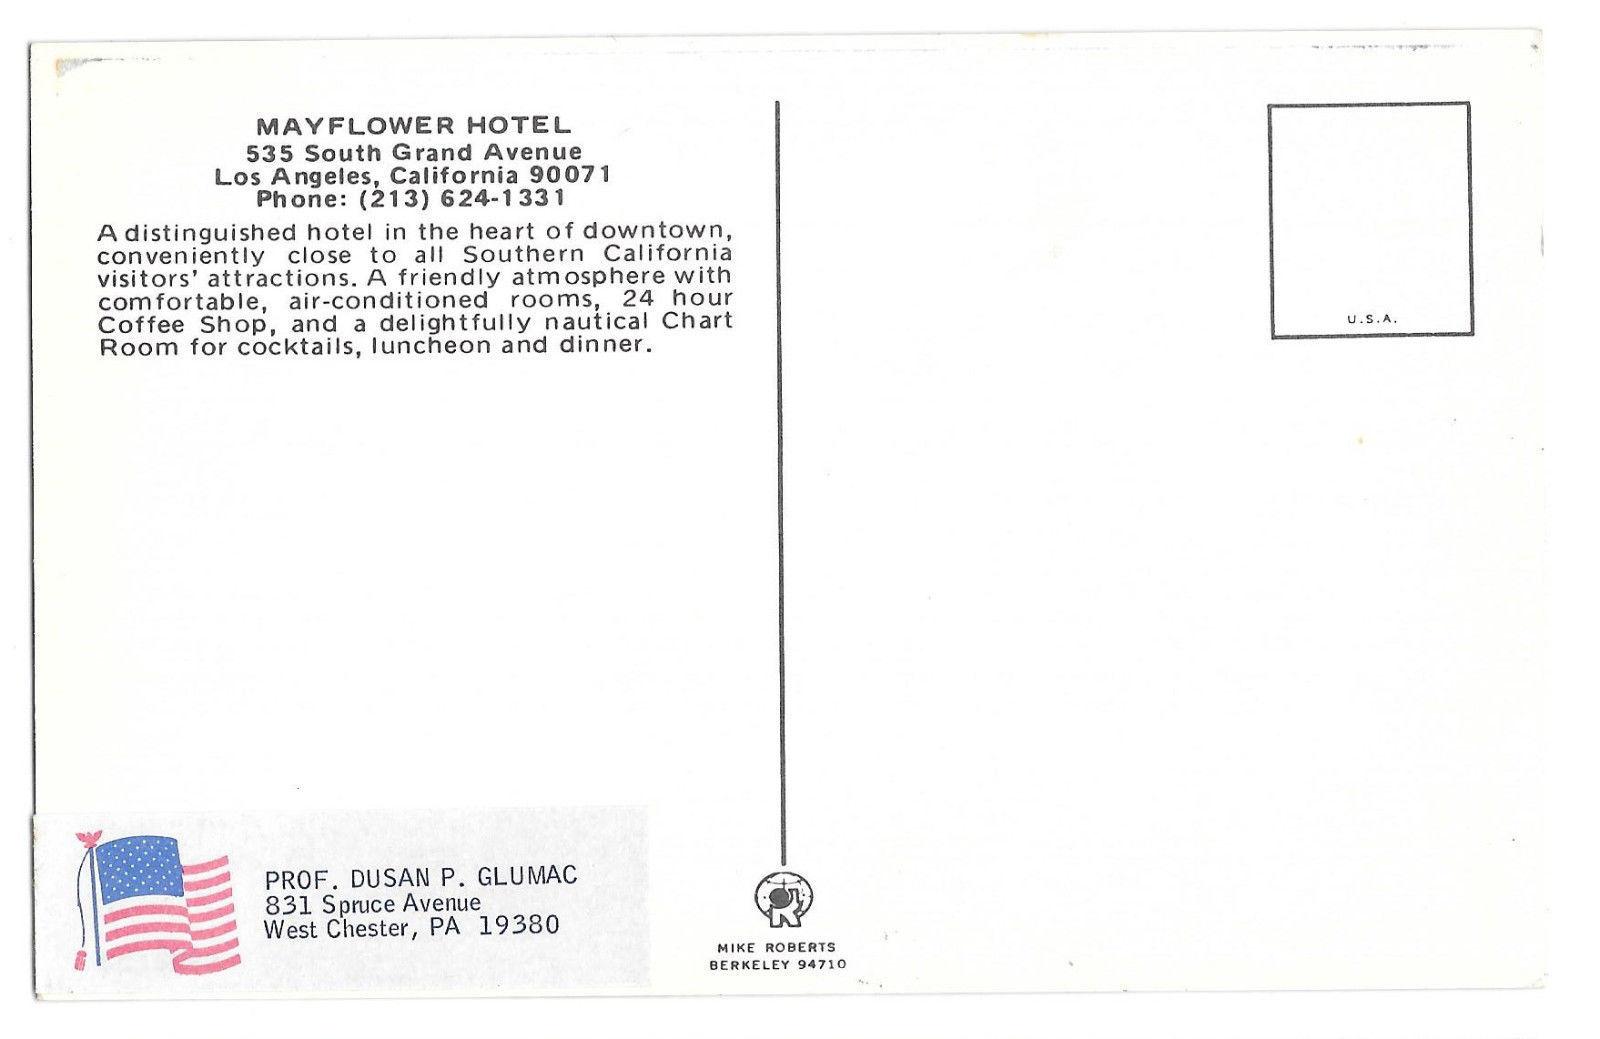 CA Los Angeles Mayflower Hotel Vtg Mike Roberts Postcard